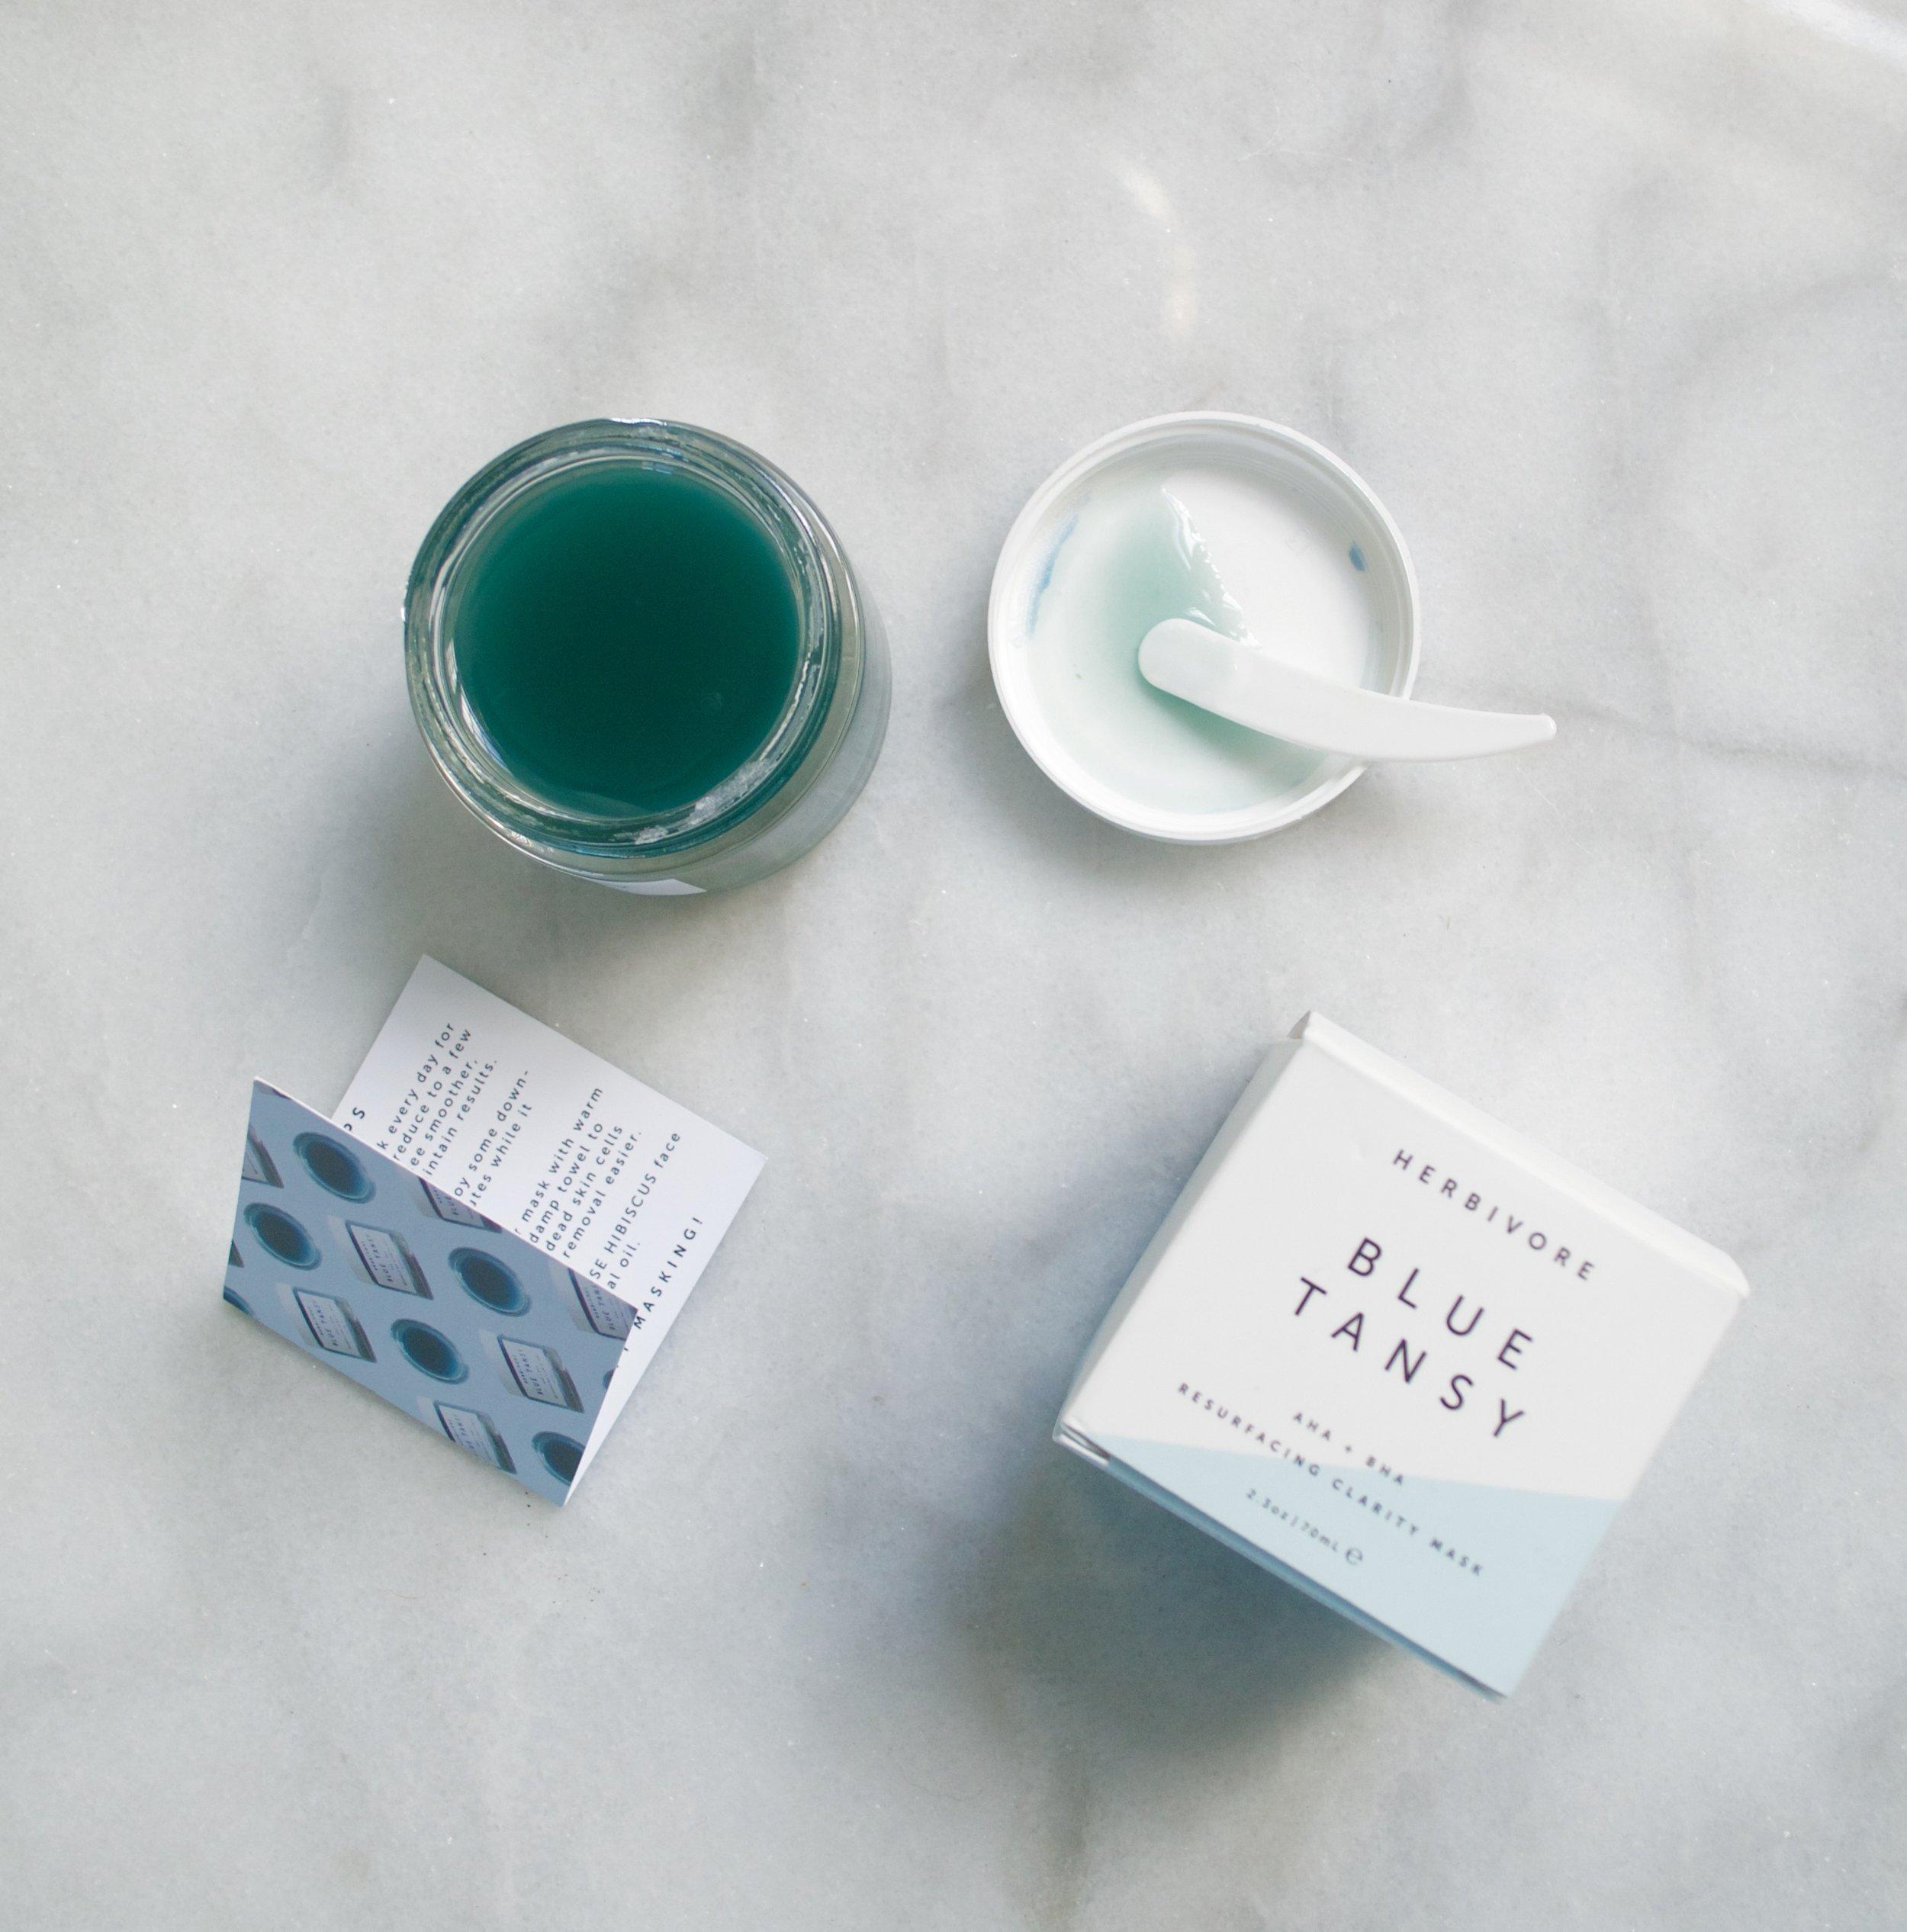 Blue Tansy Herbivore AHA BHA Resurfacing Clarity Mask